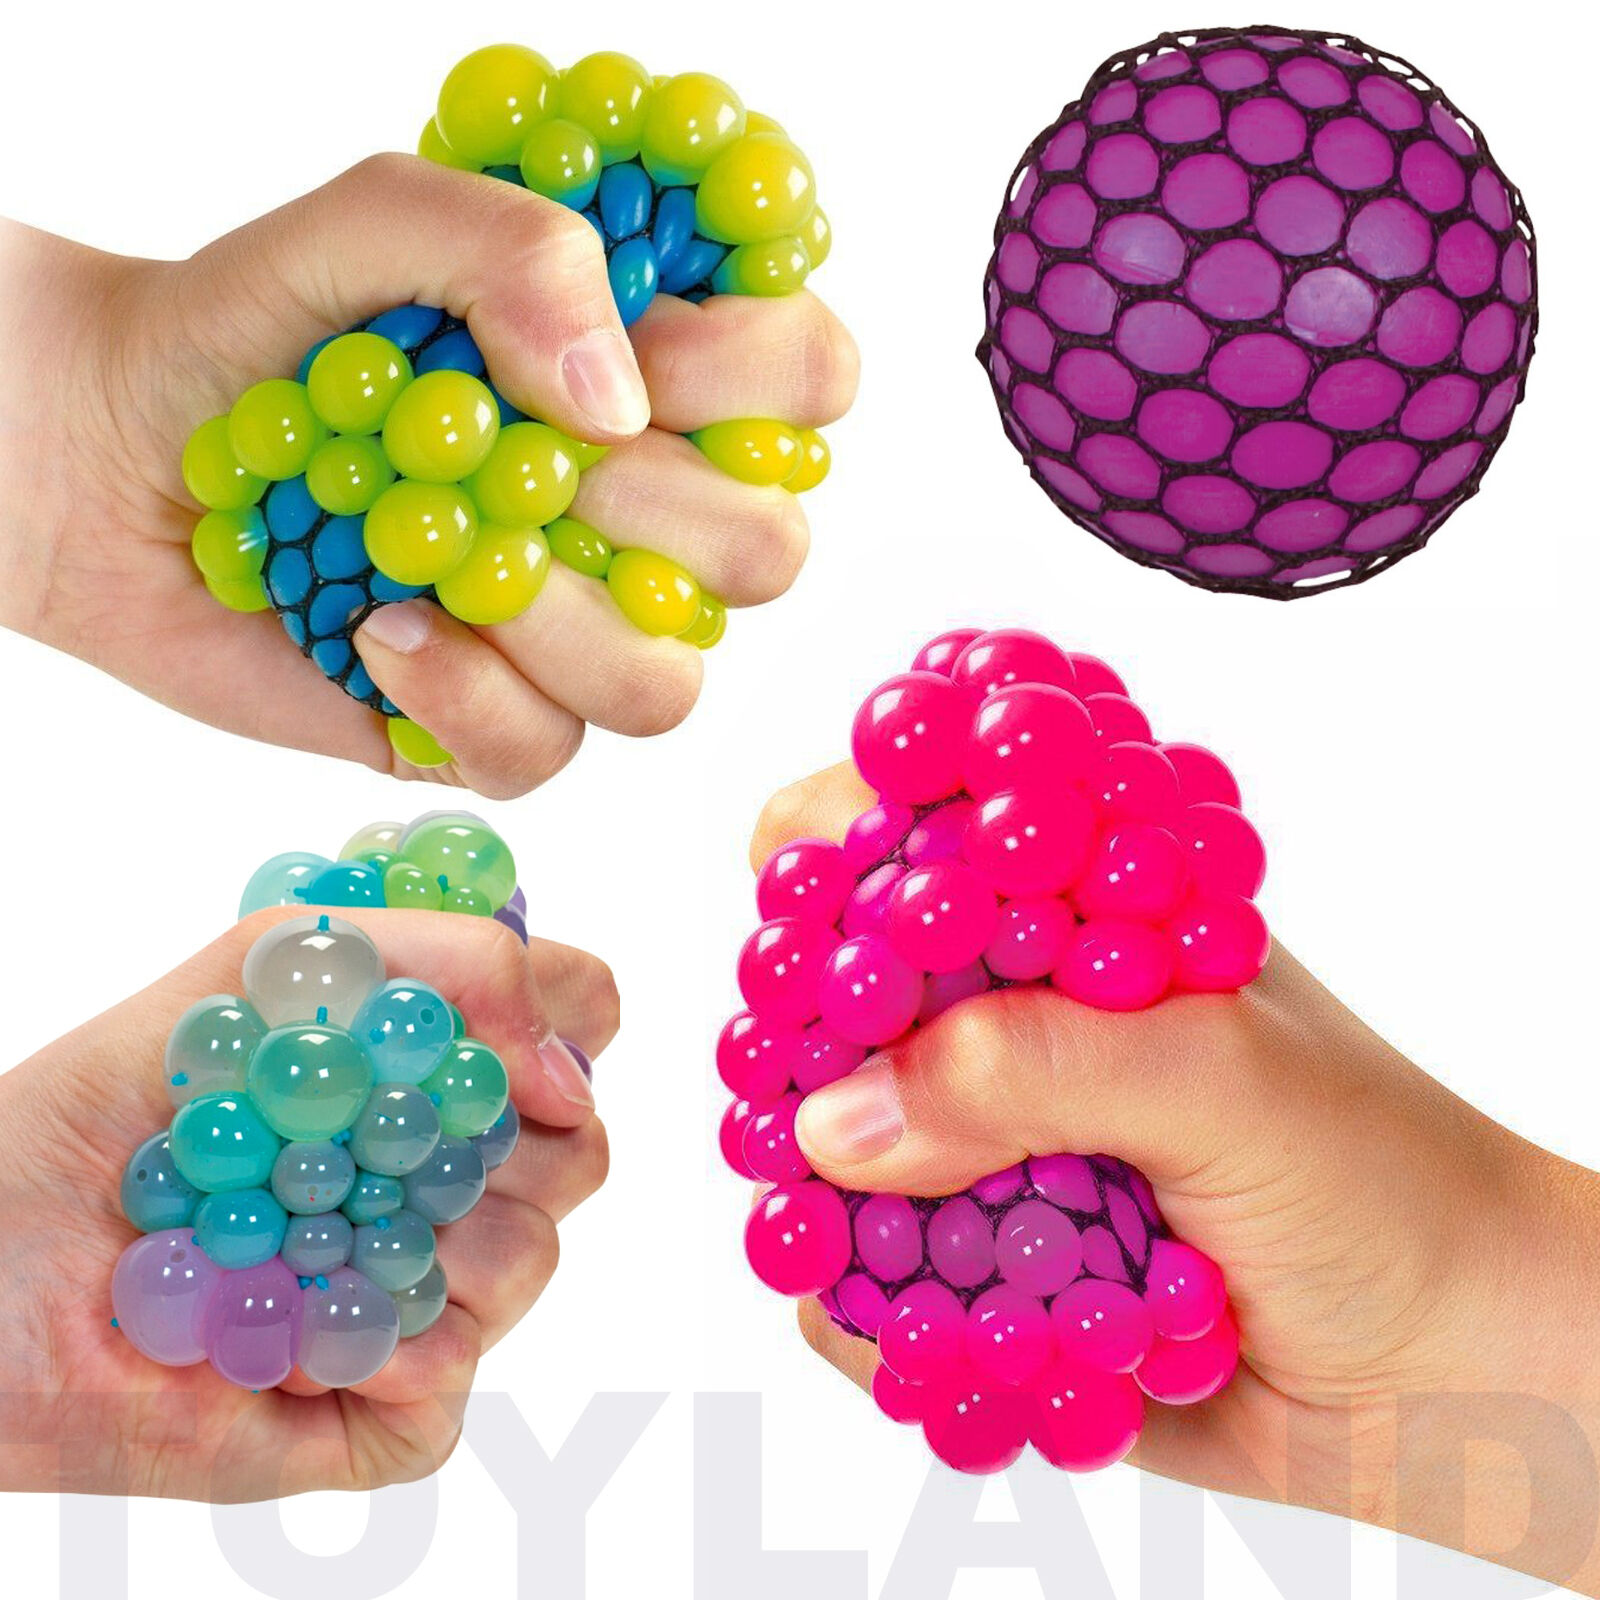 Mesh ball squeezy stress toy boys girl fidget xmas